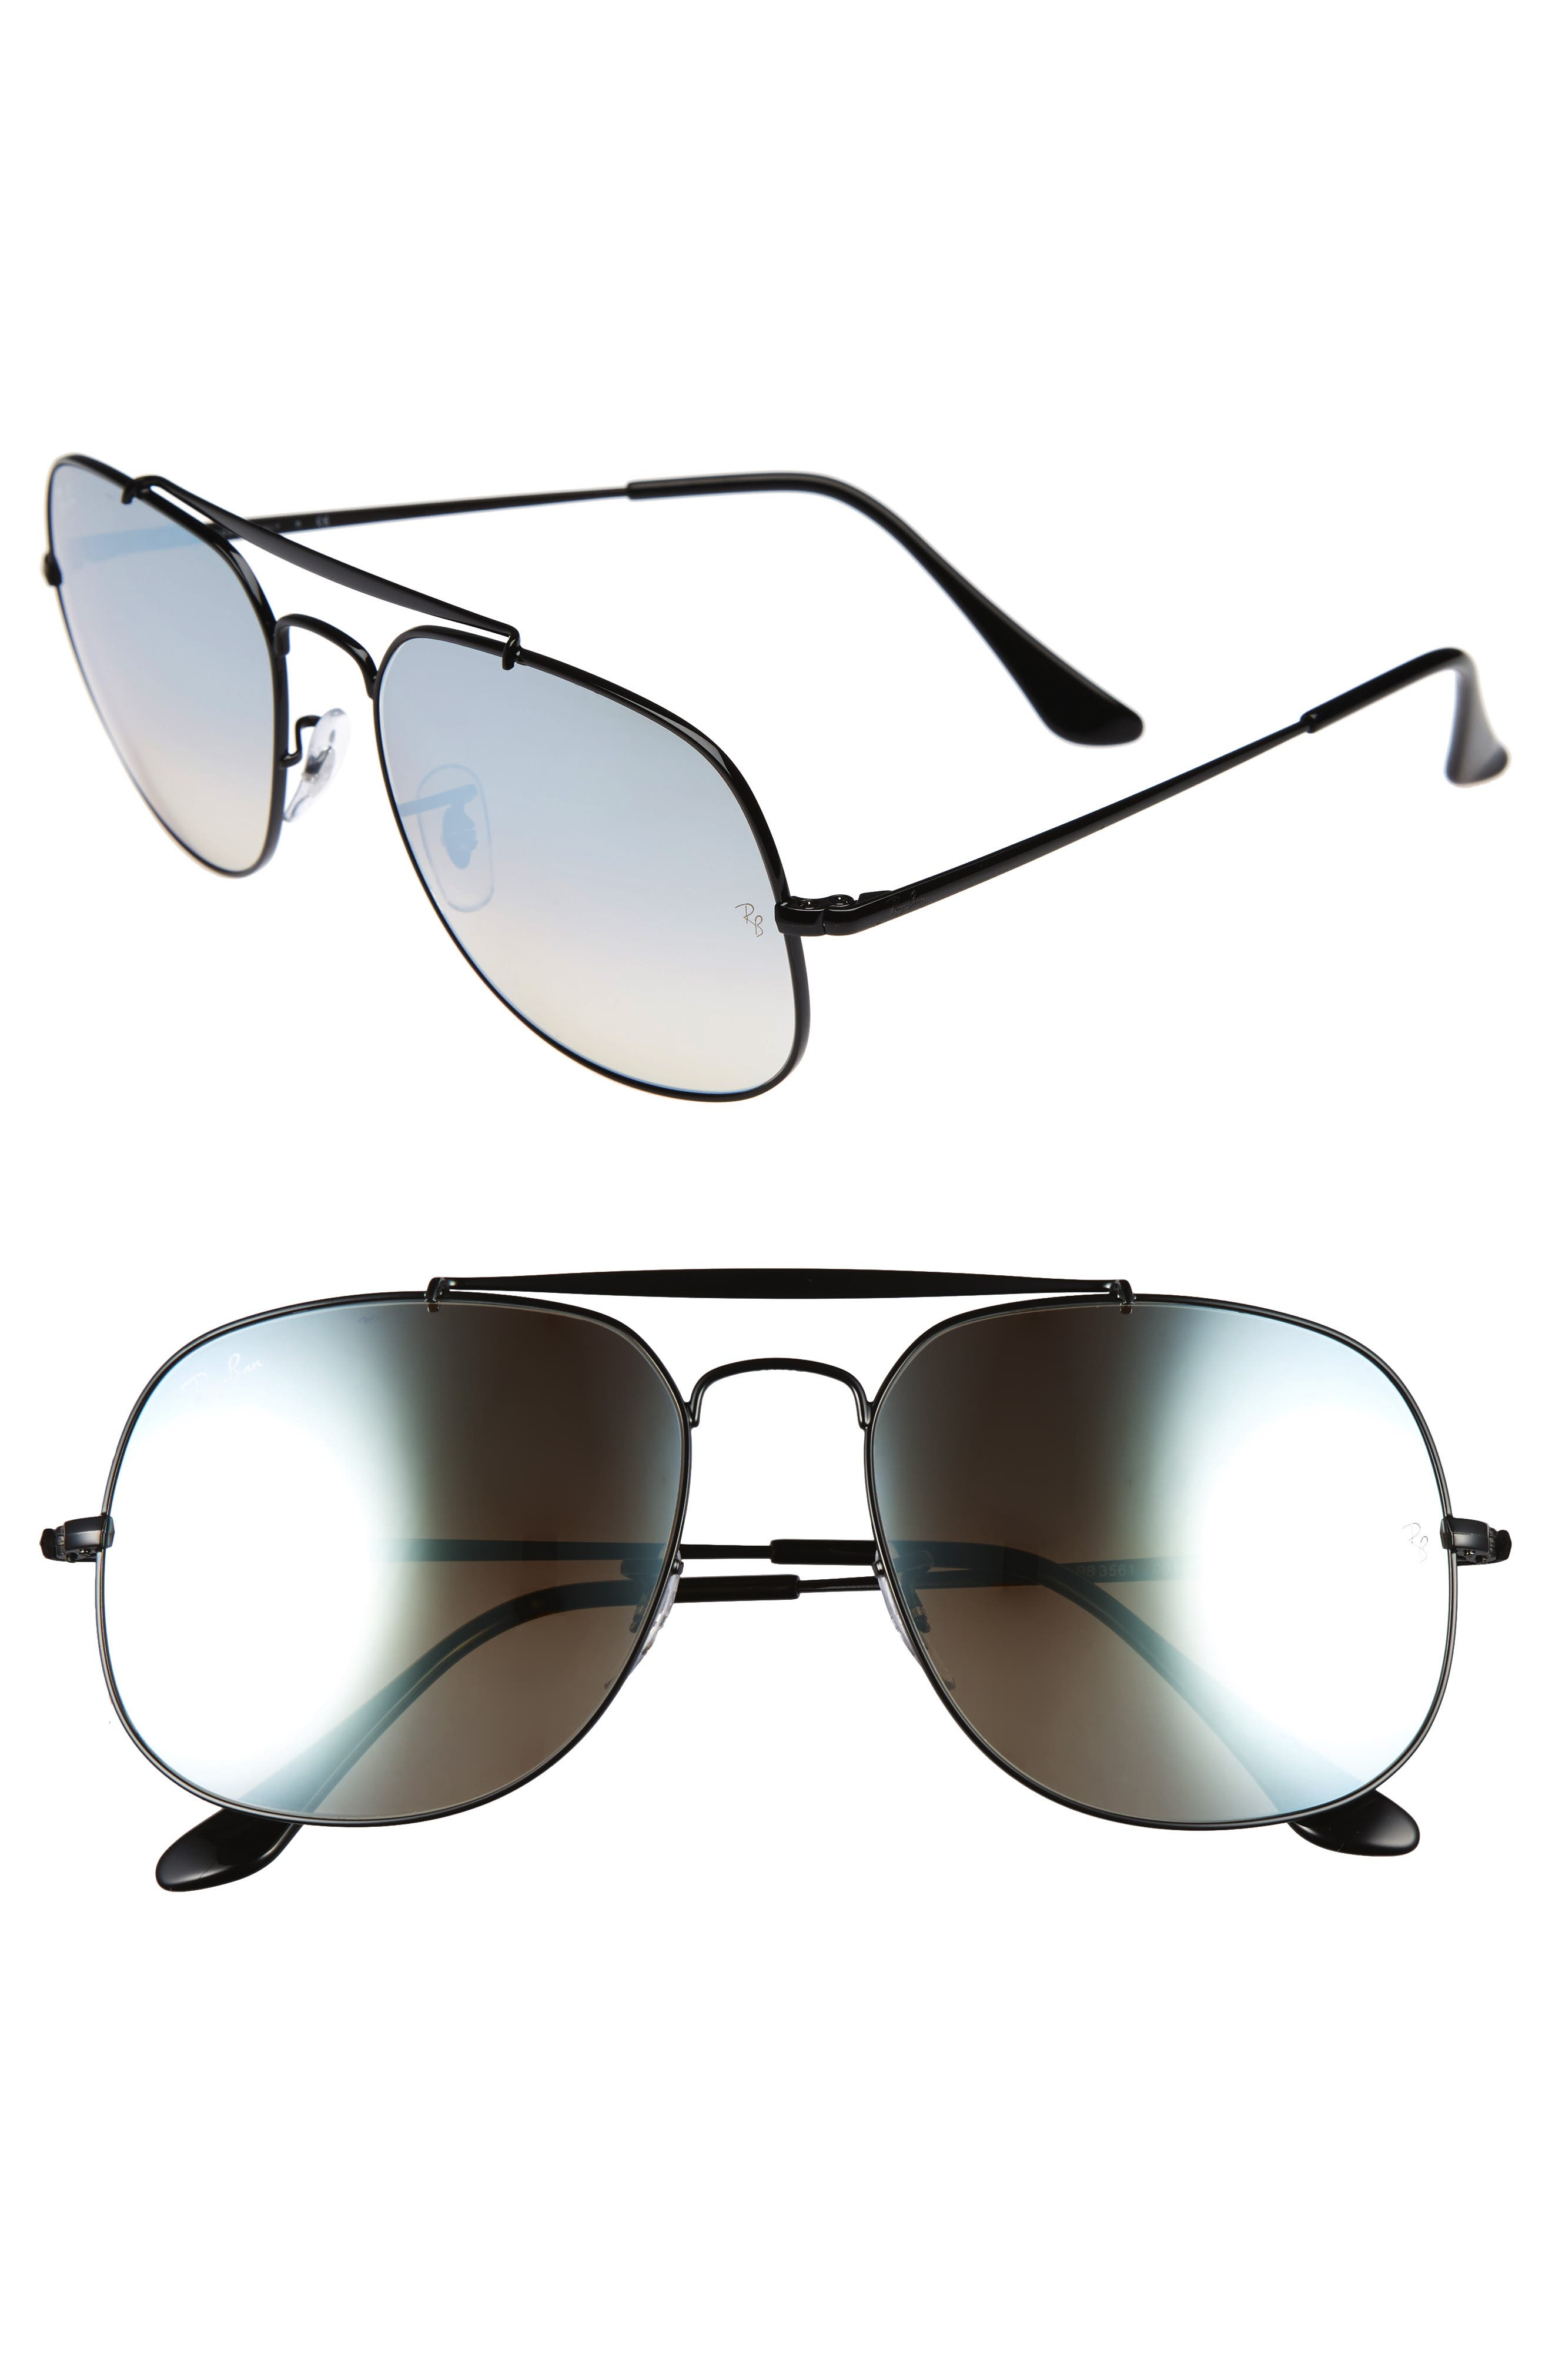 57mm Aviator Sunglasses,                         Main,                         color, Black